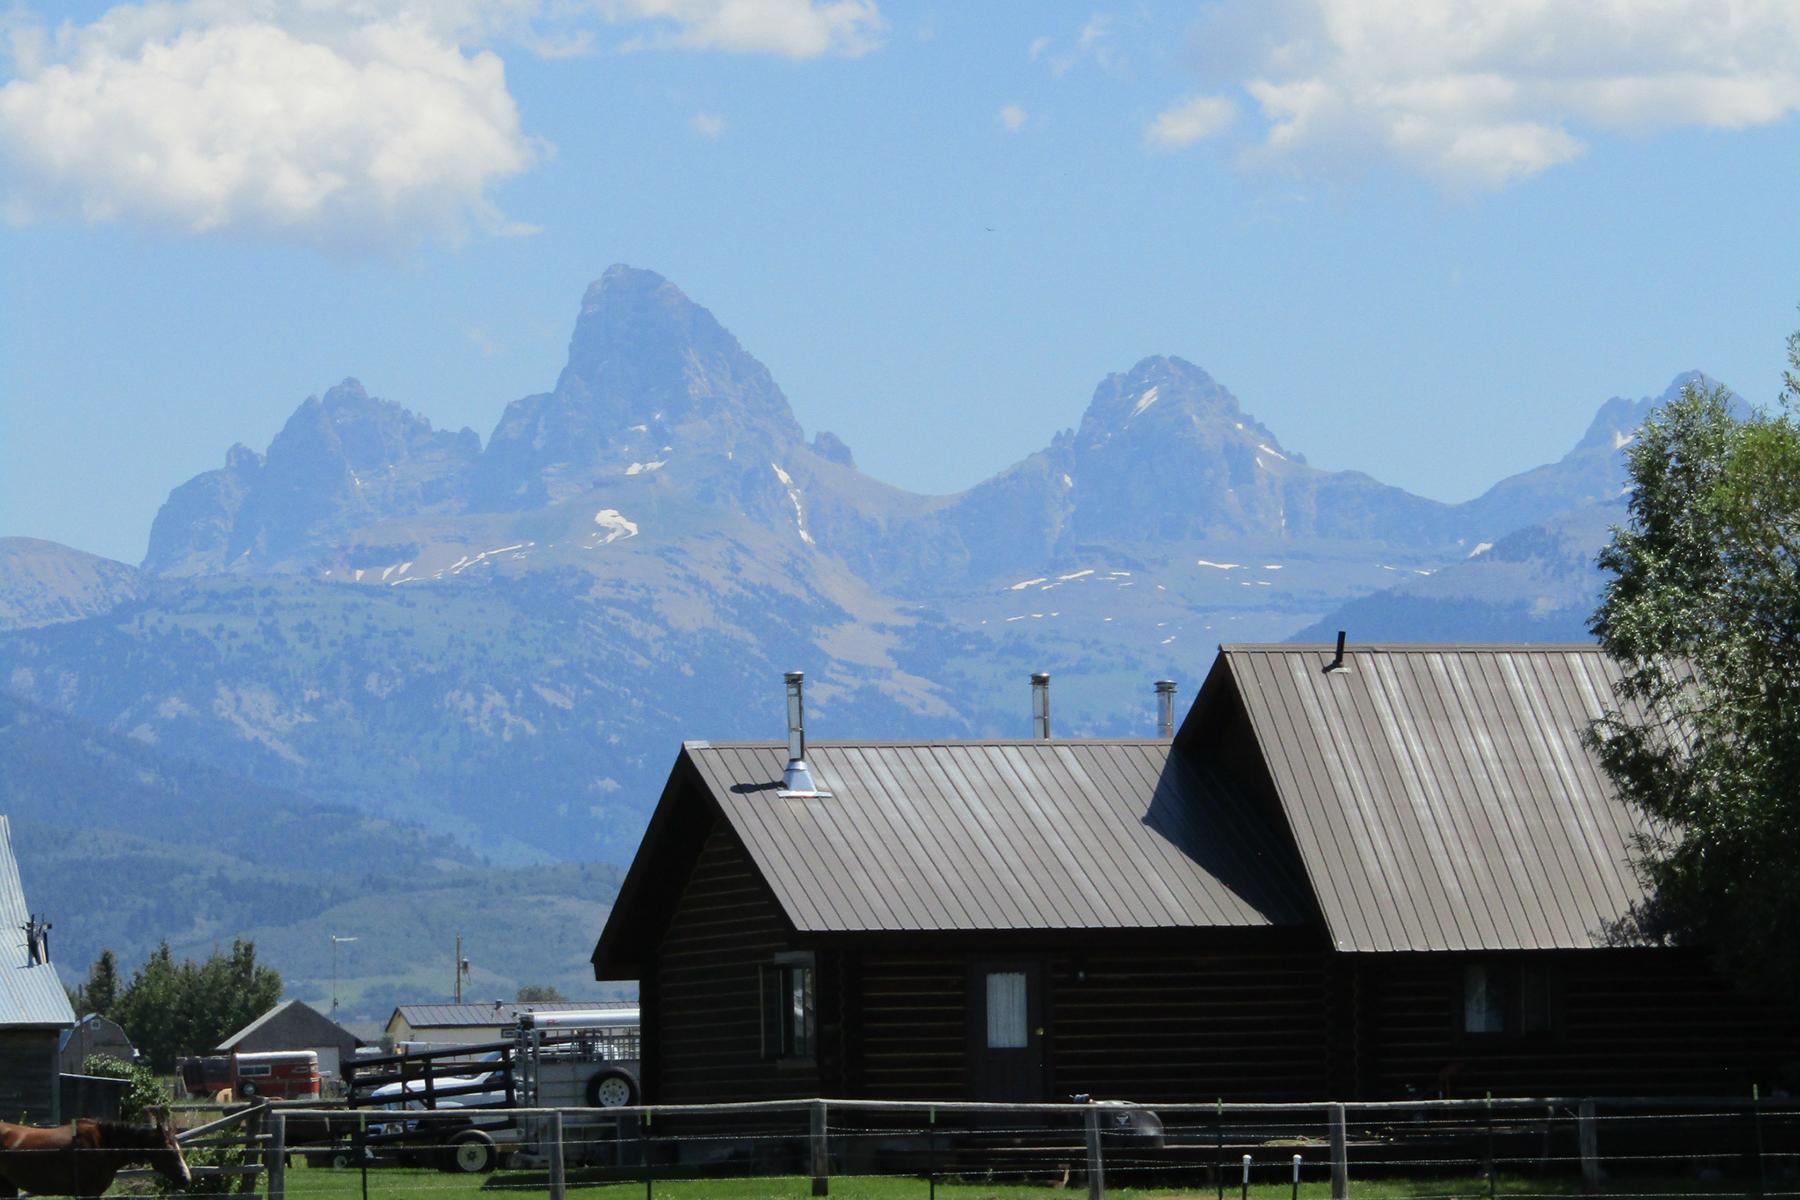 Single Family Homes for Sale at 1890 N 4000 1890 W 4000 N Tetonia, Idaho 83452 United States